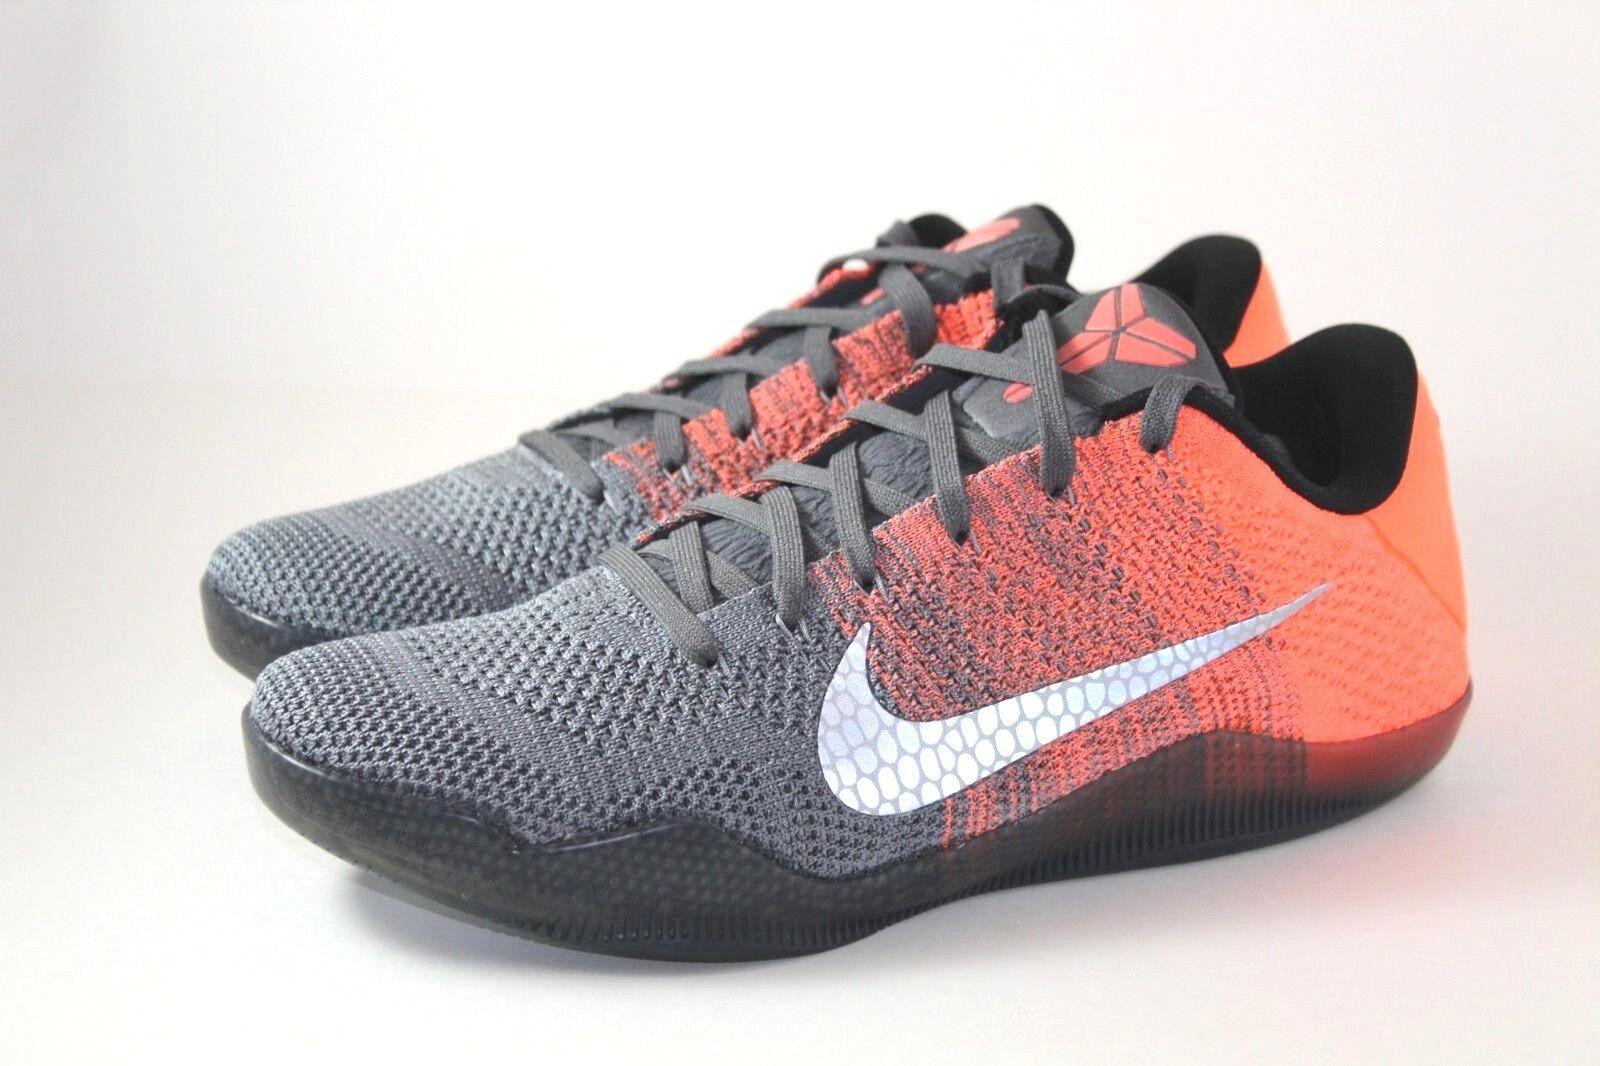 Nike zoom kobe xi 11 elite basso pasqua basket scarpa mango 822675-078 46